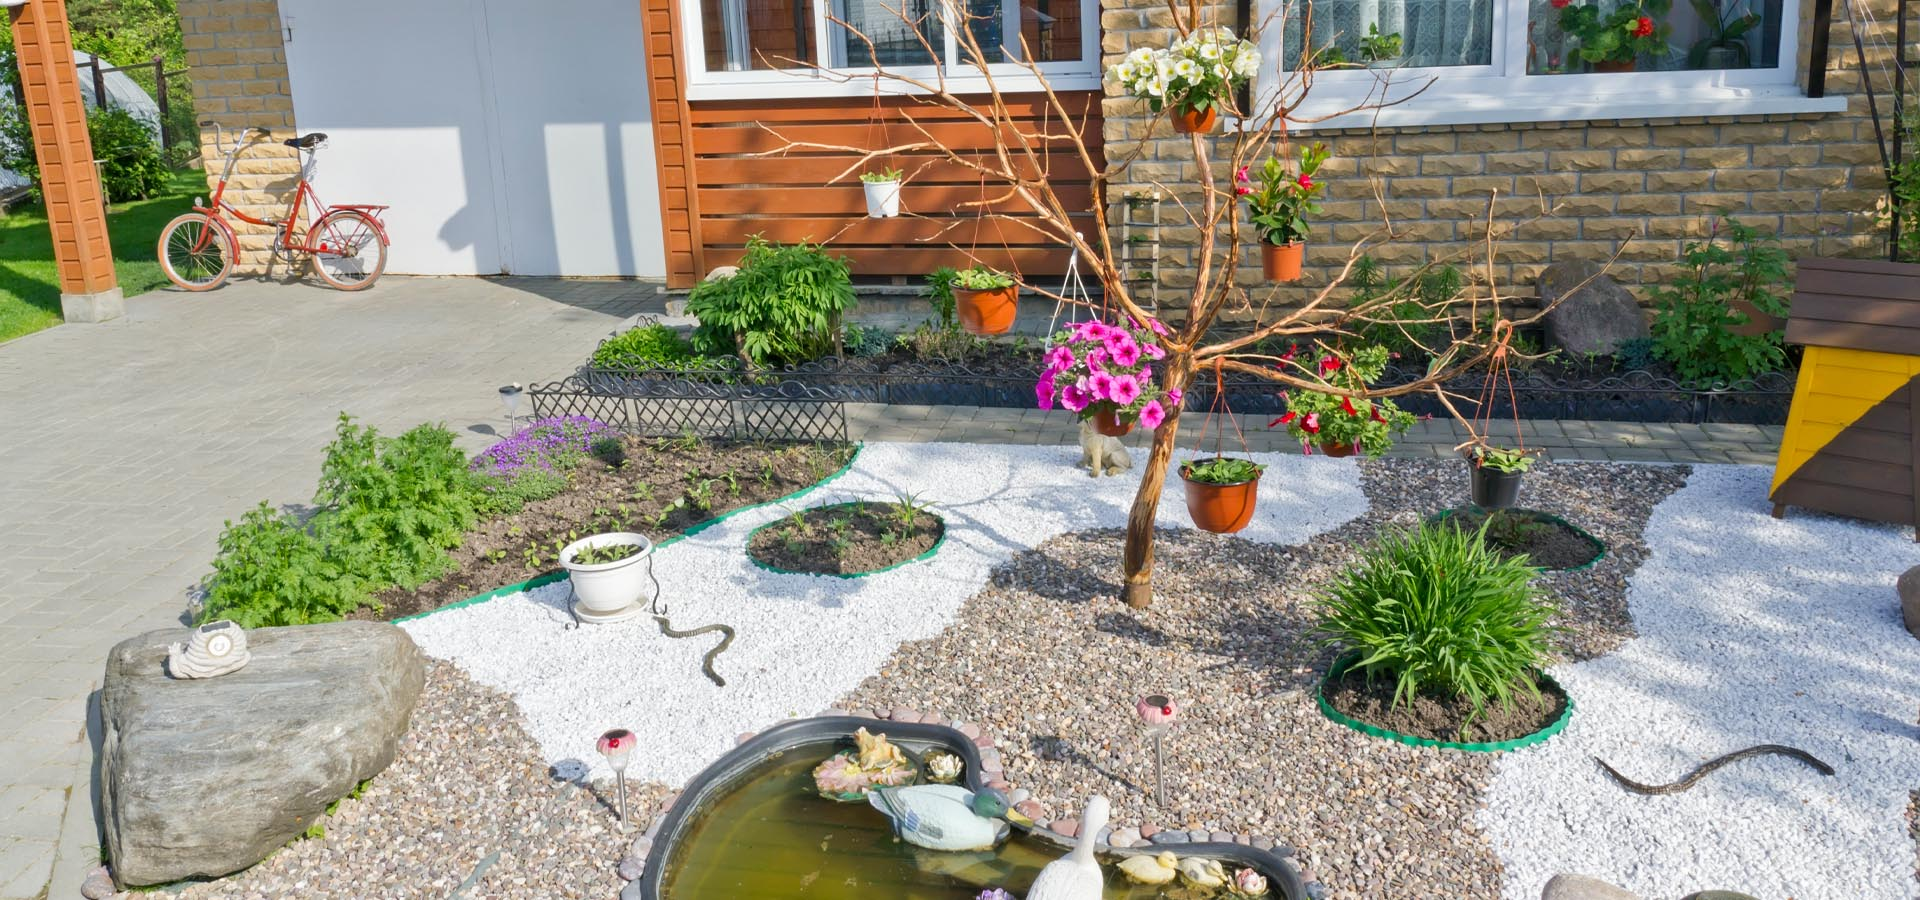 Ten tips for using gravel in your front garden